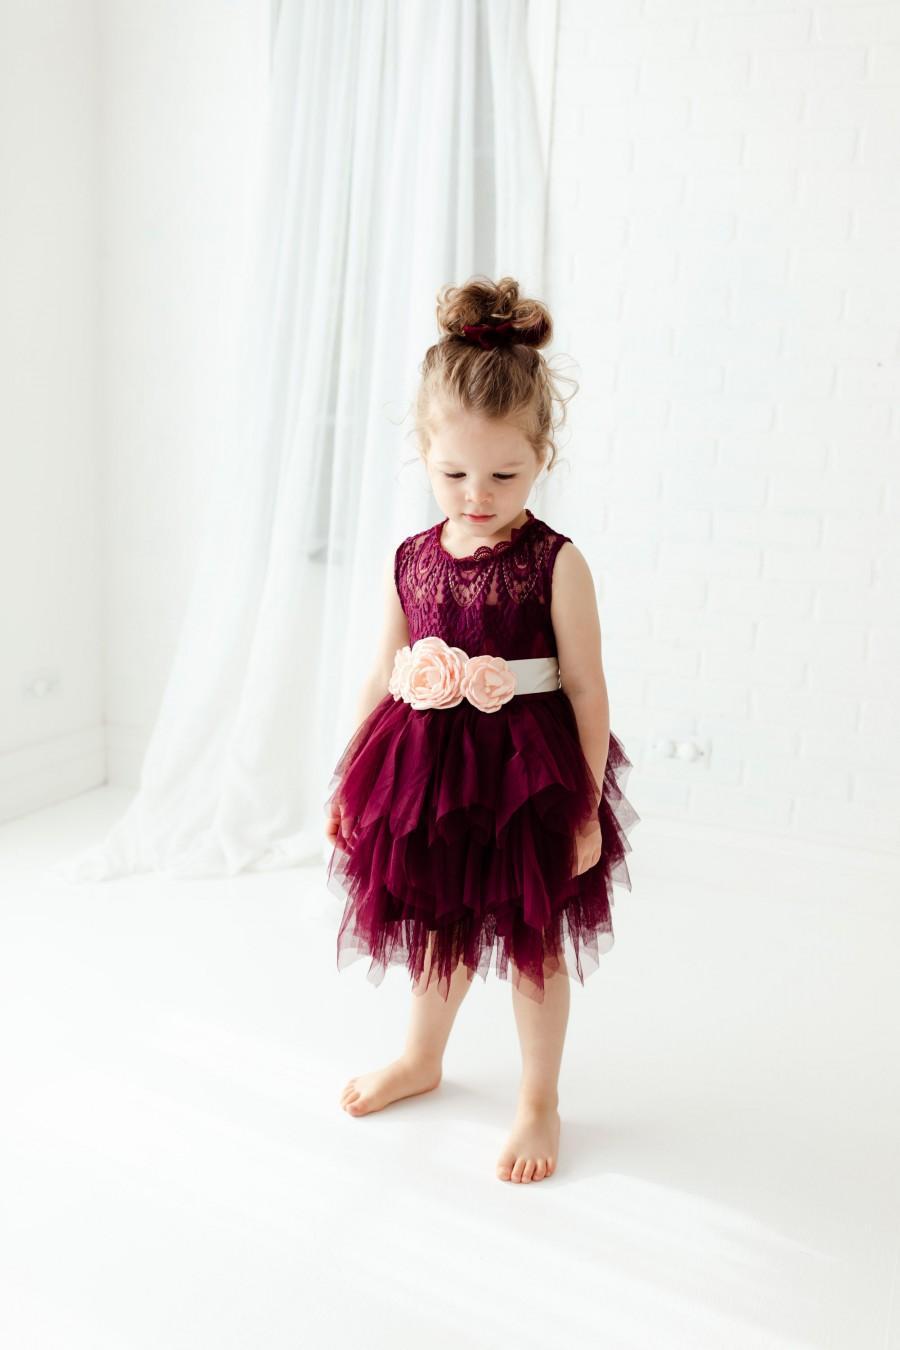 Hochzeit - Boho Burgundy Lace Flower Girl Dress, Will You Be My Flower Girl, Wine Tulle Flower Girl Dresses, Maroon Plum  Dress